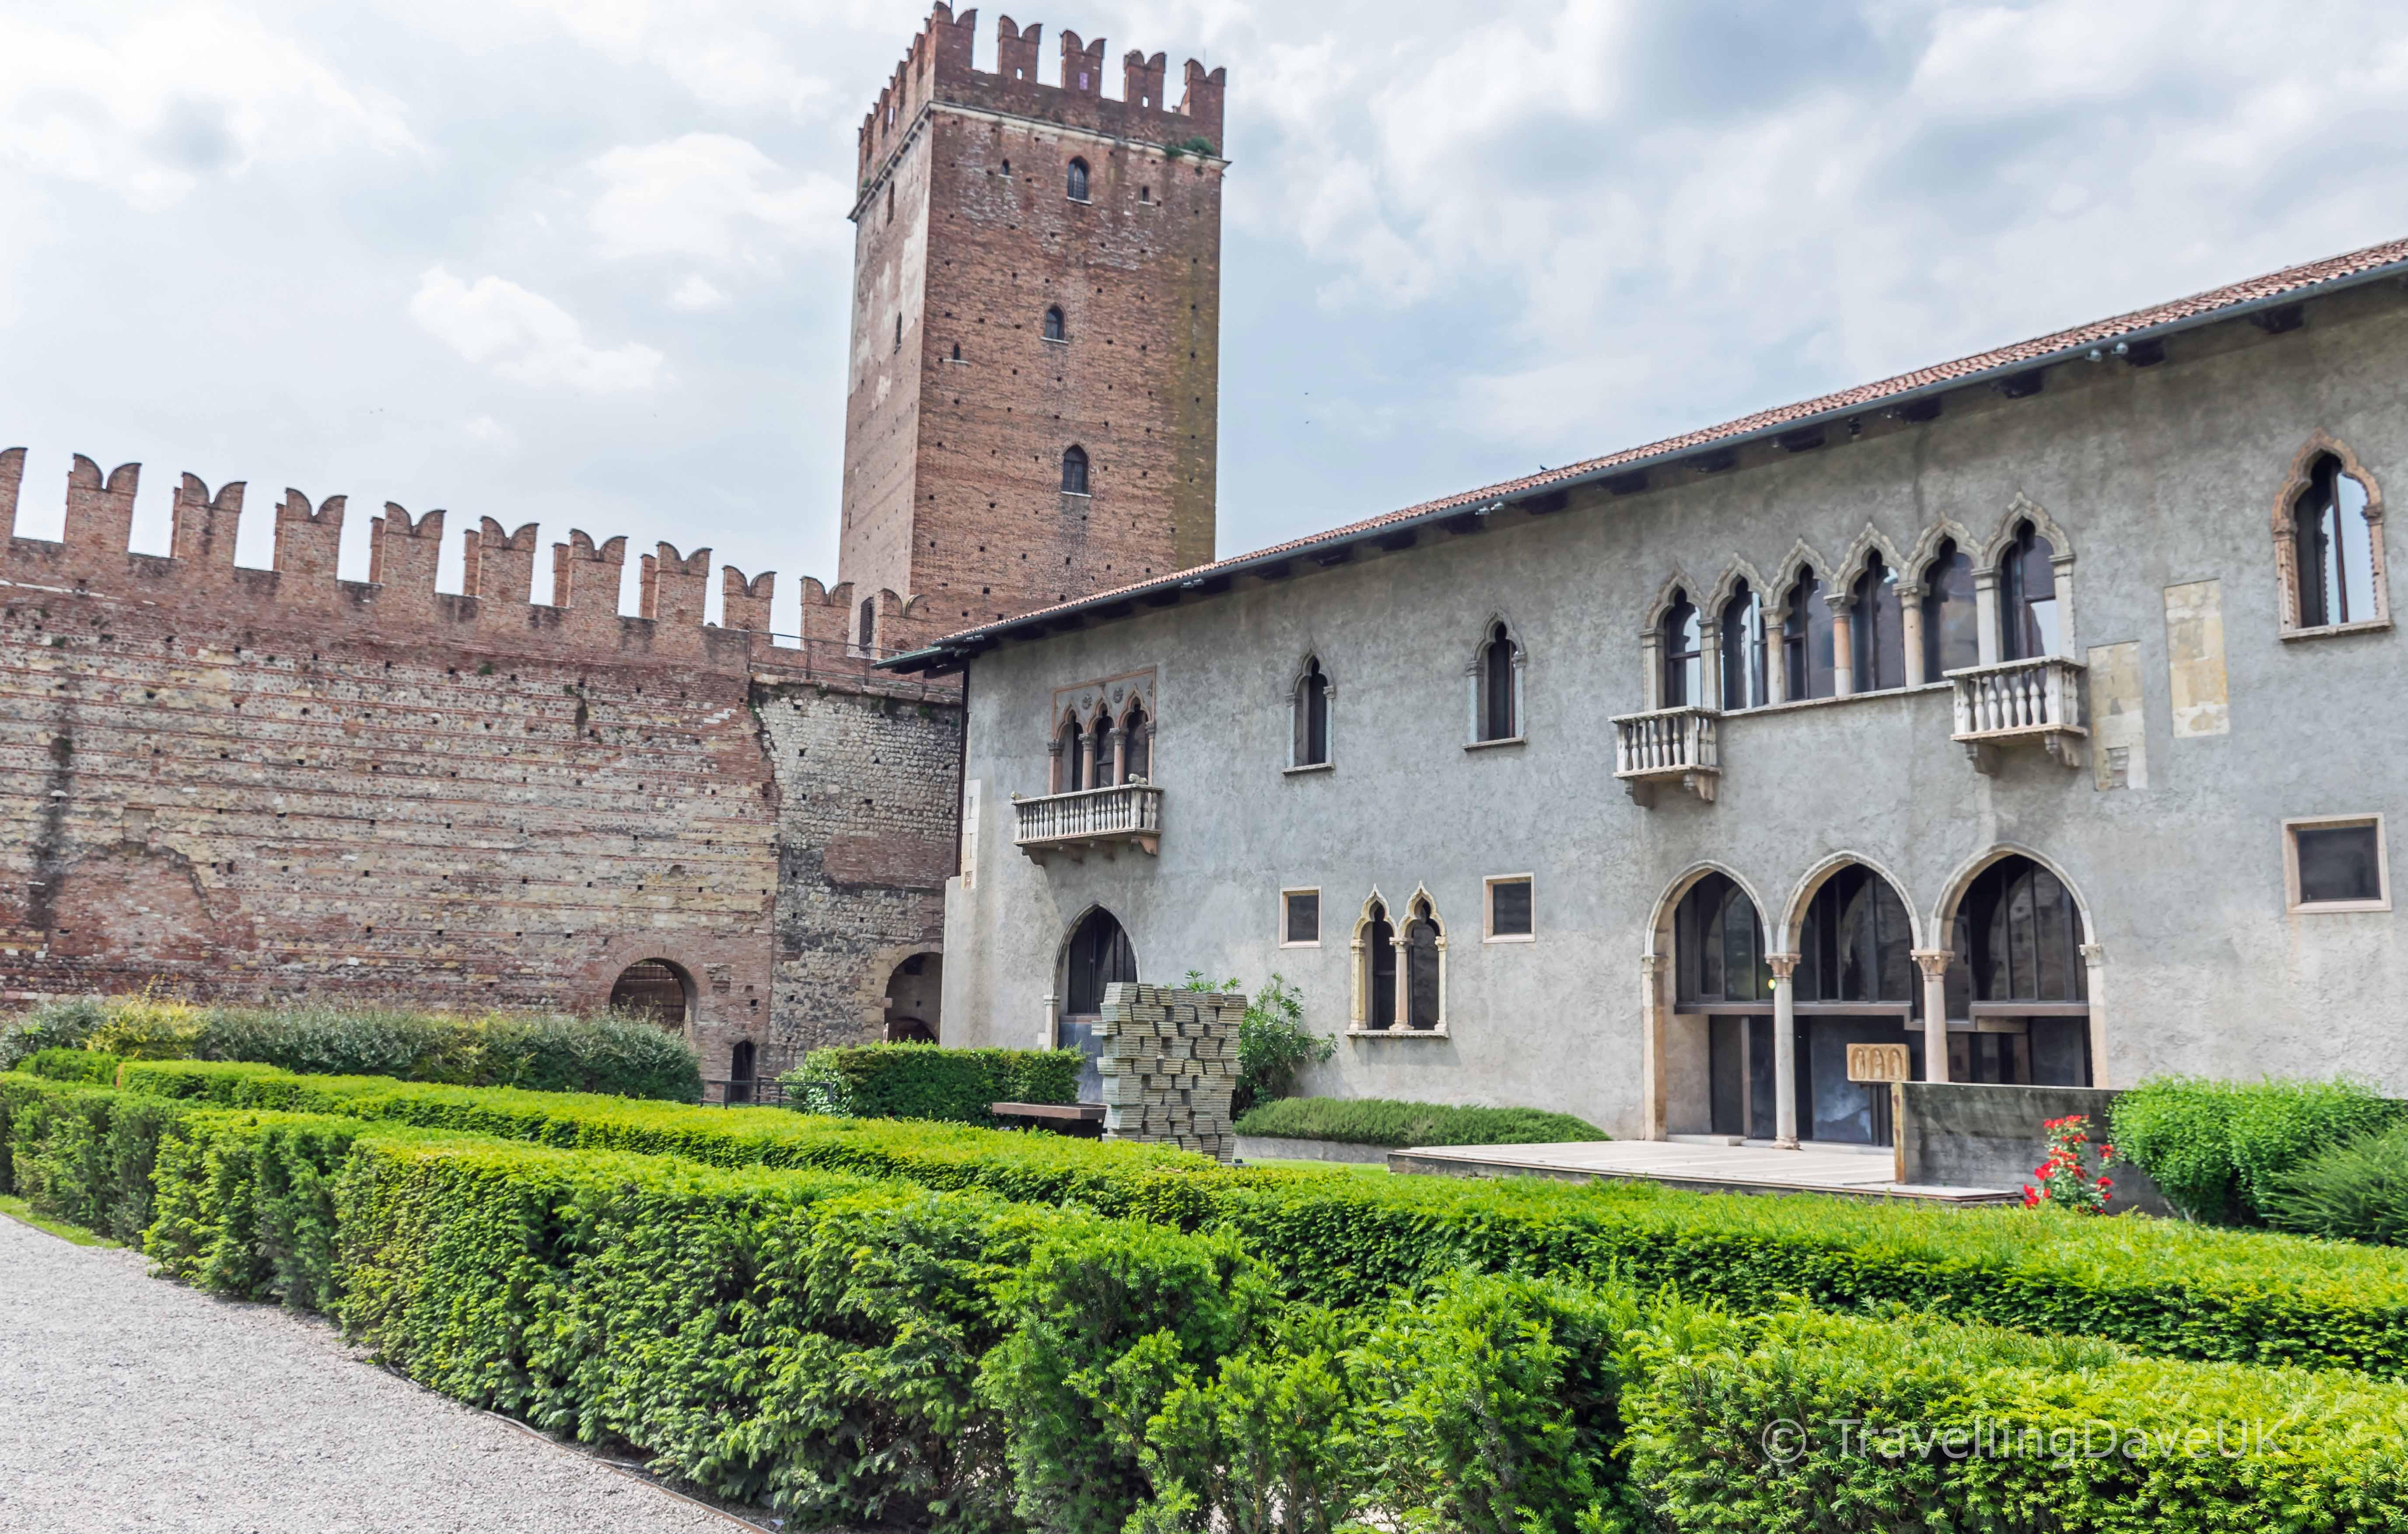 View of the courtyard of Castelvecchio